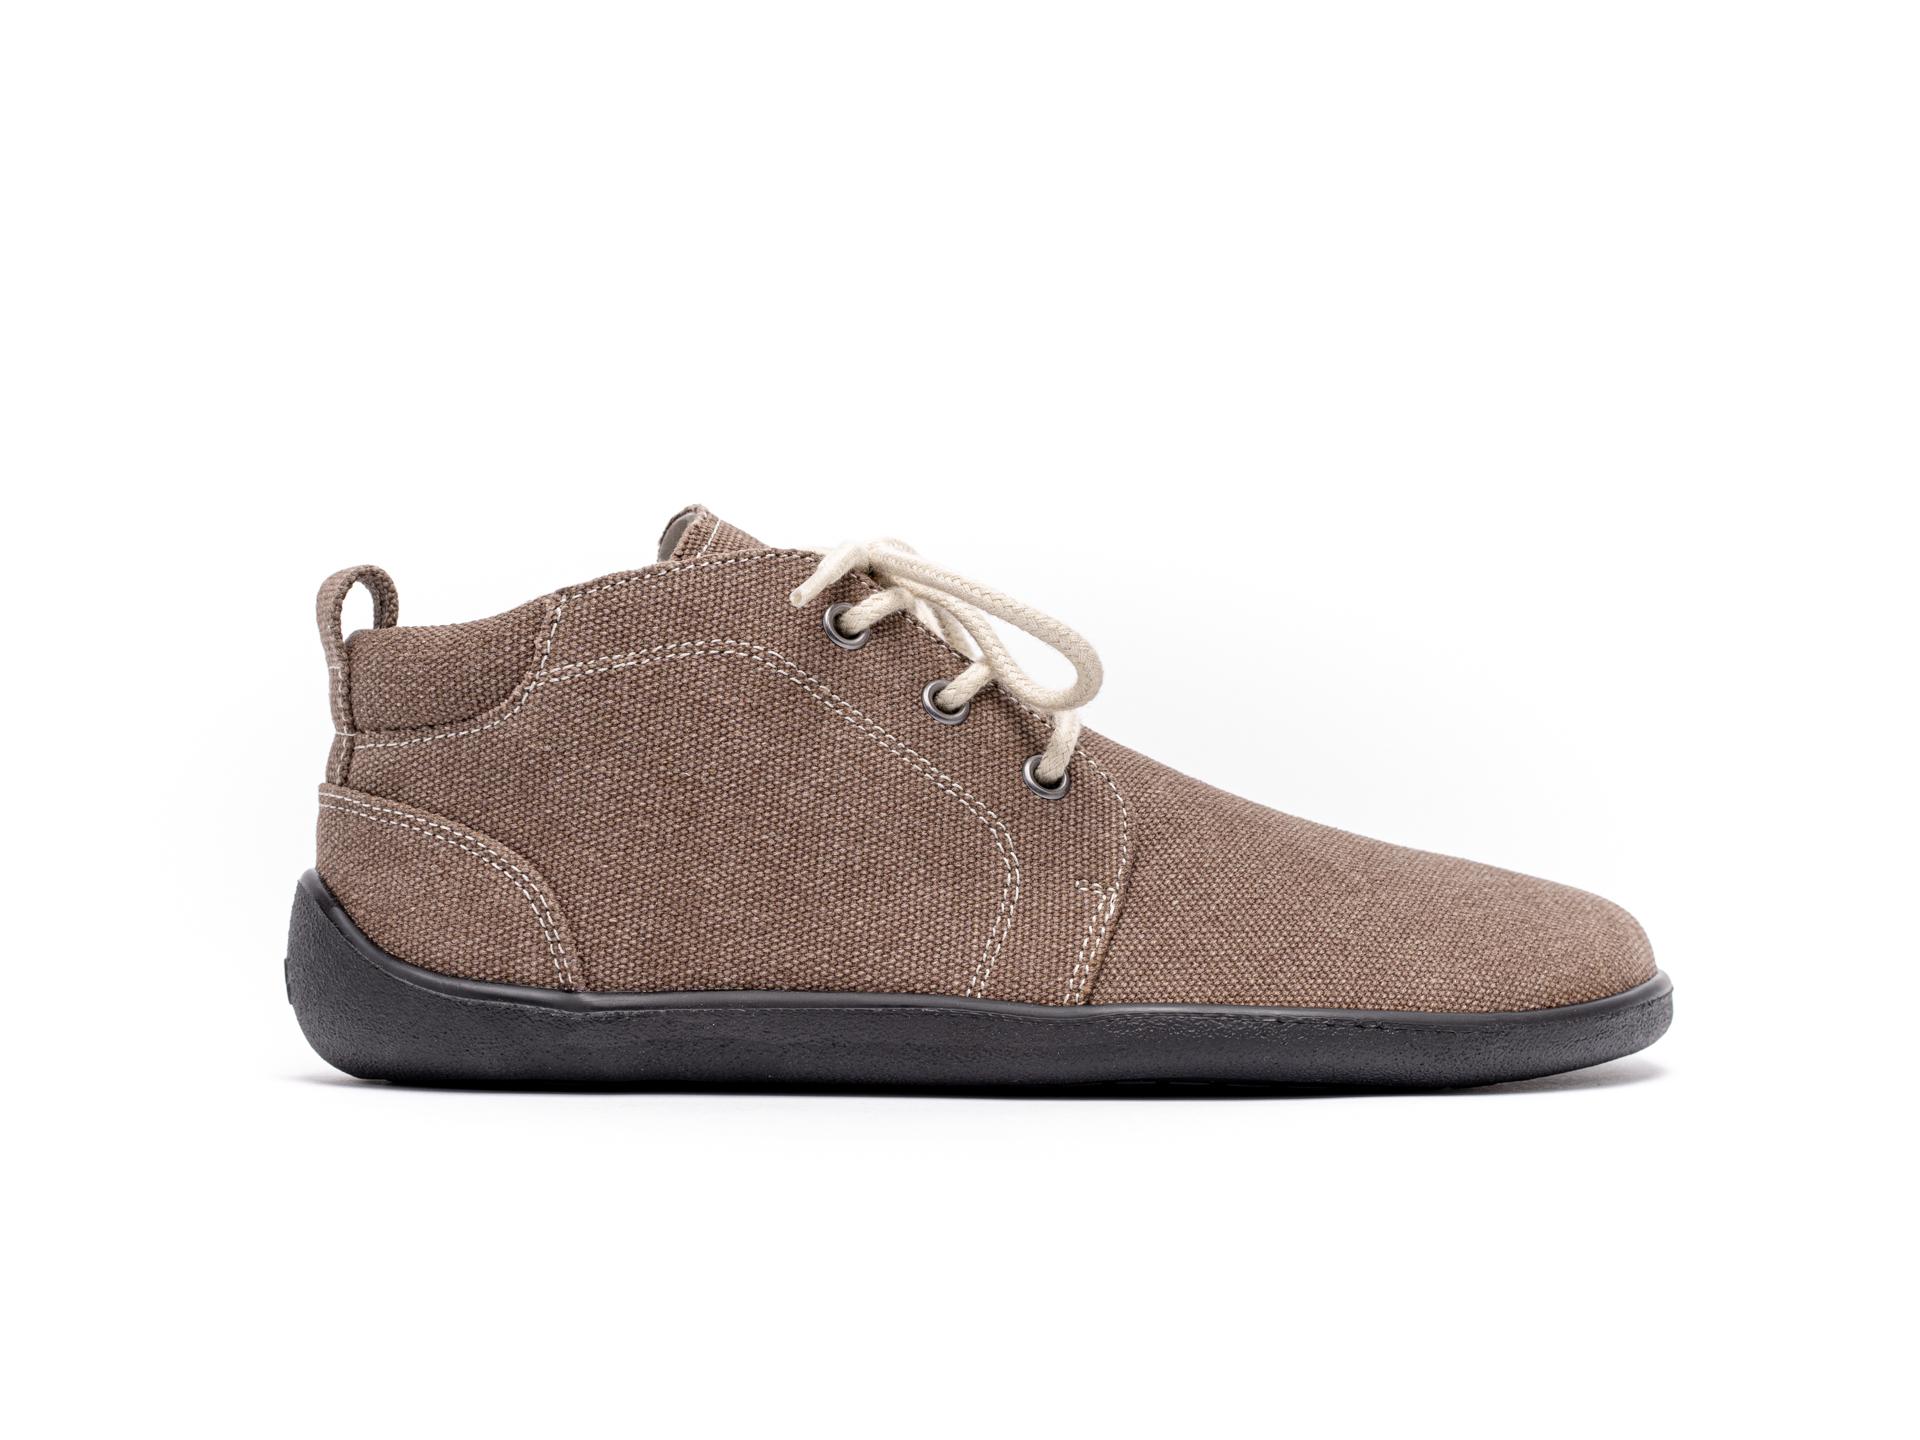 Barefoot Shoes - Be Lenka - Icon - Vegan - Bhoomi 36